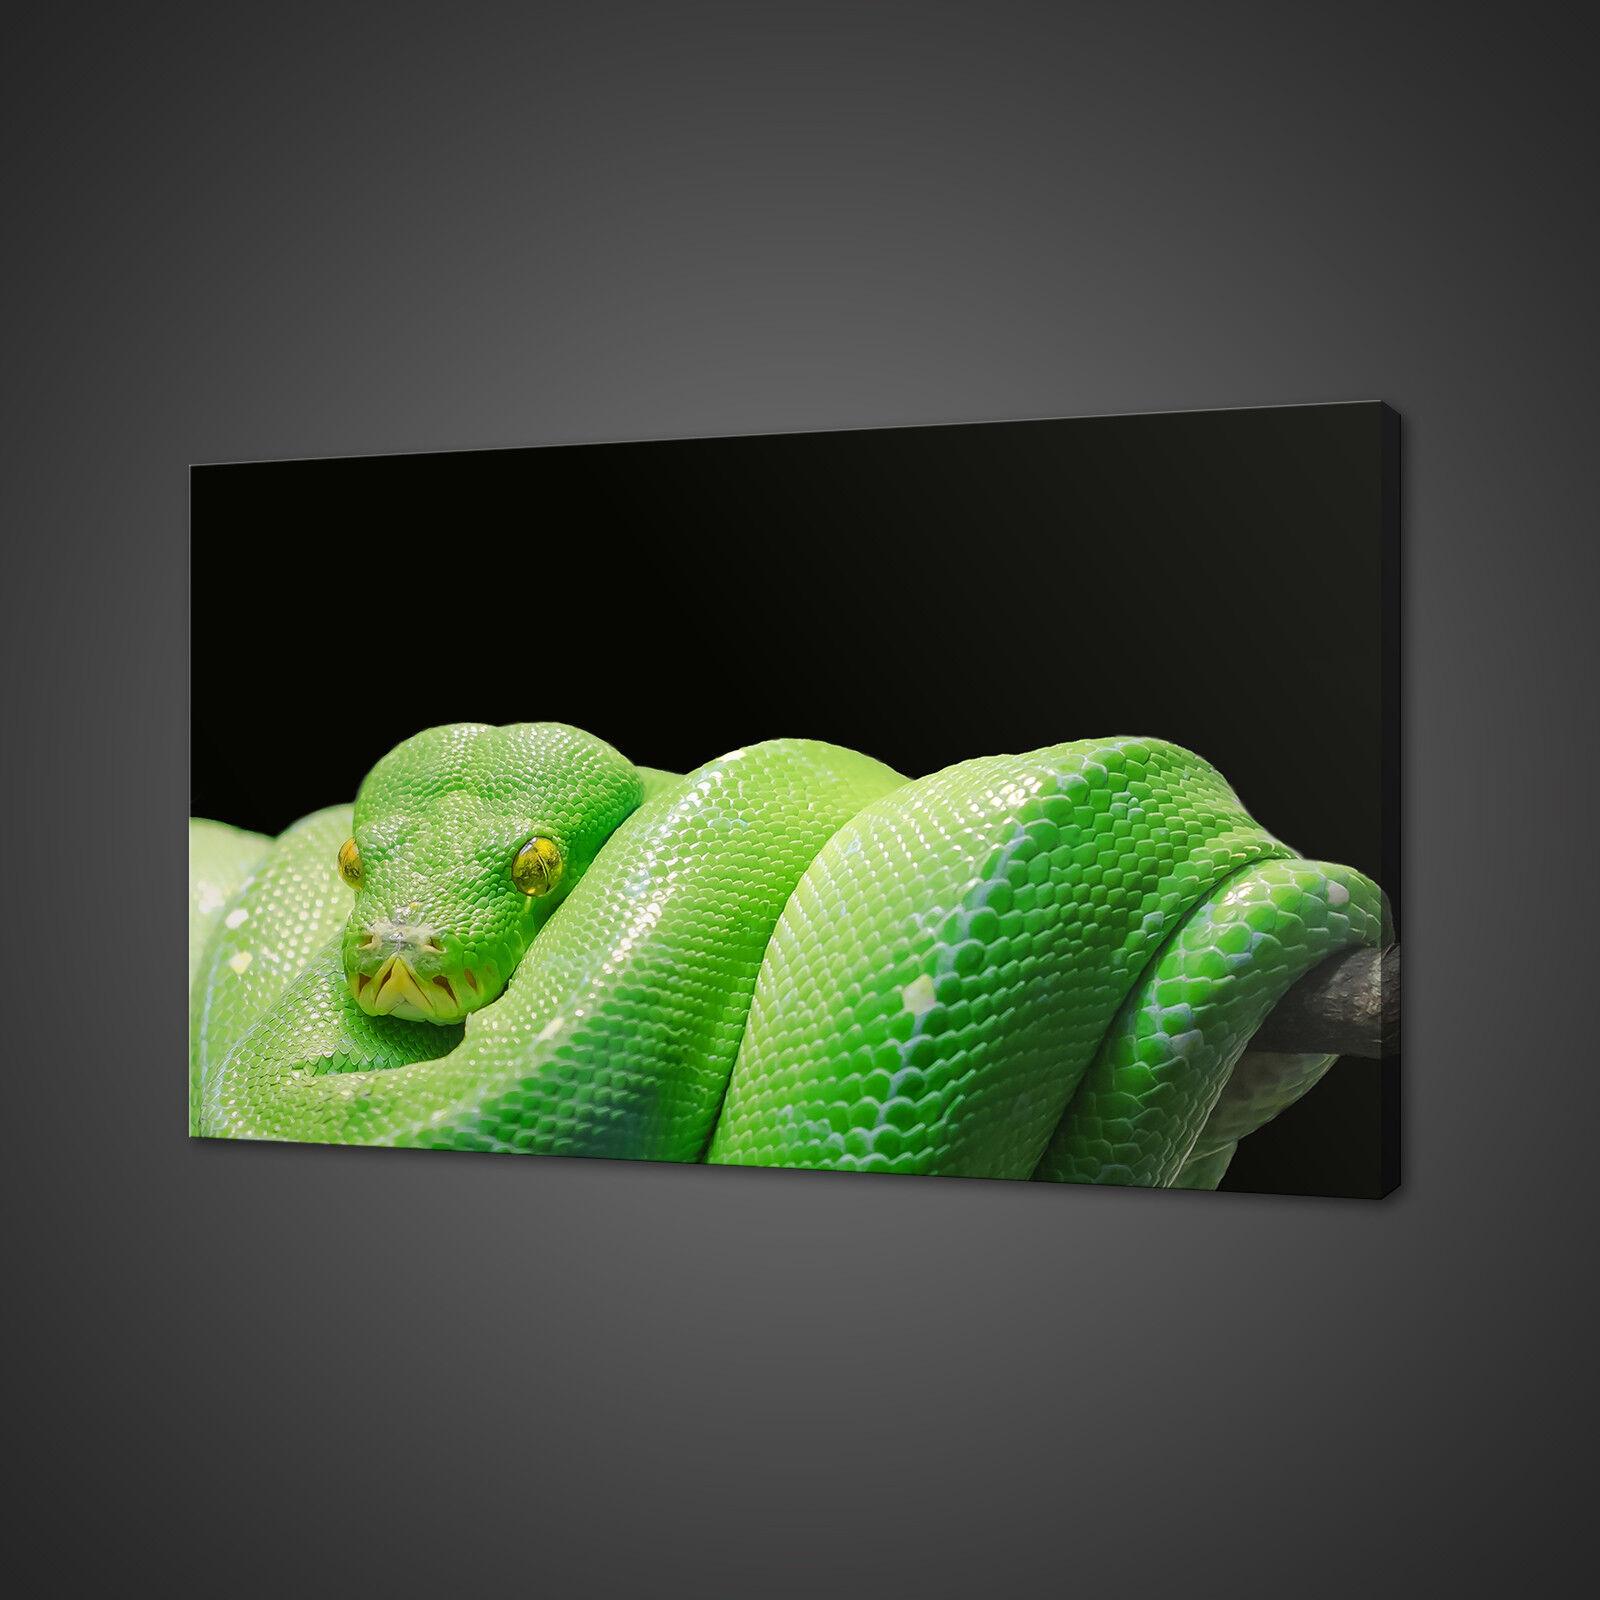 BELLISSIMO ALBERO verde Python serpente animale stampa art. a muro FOTO PHOTO